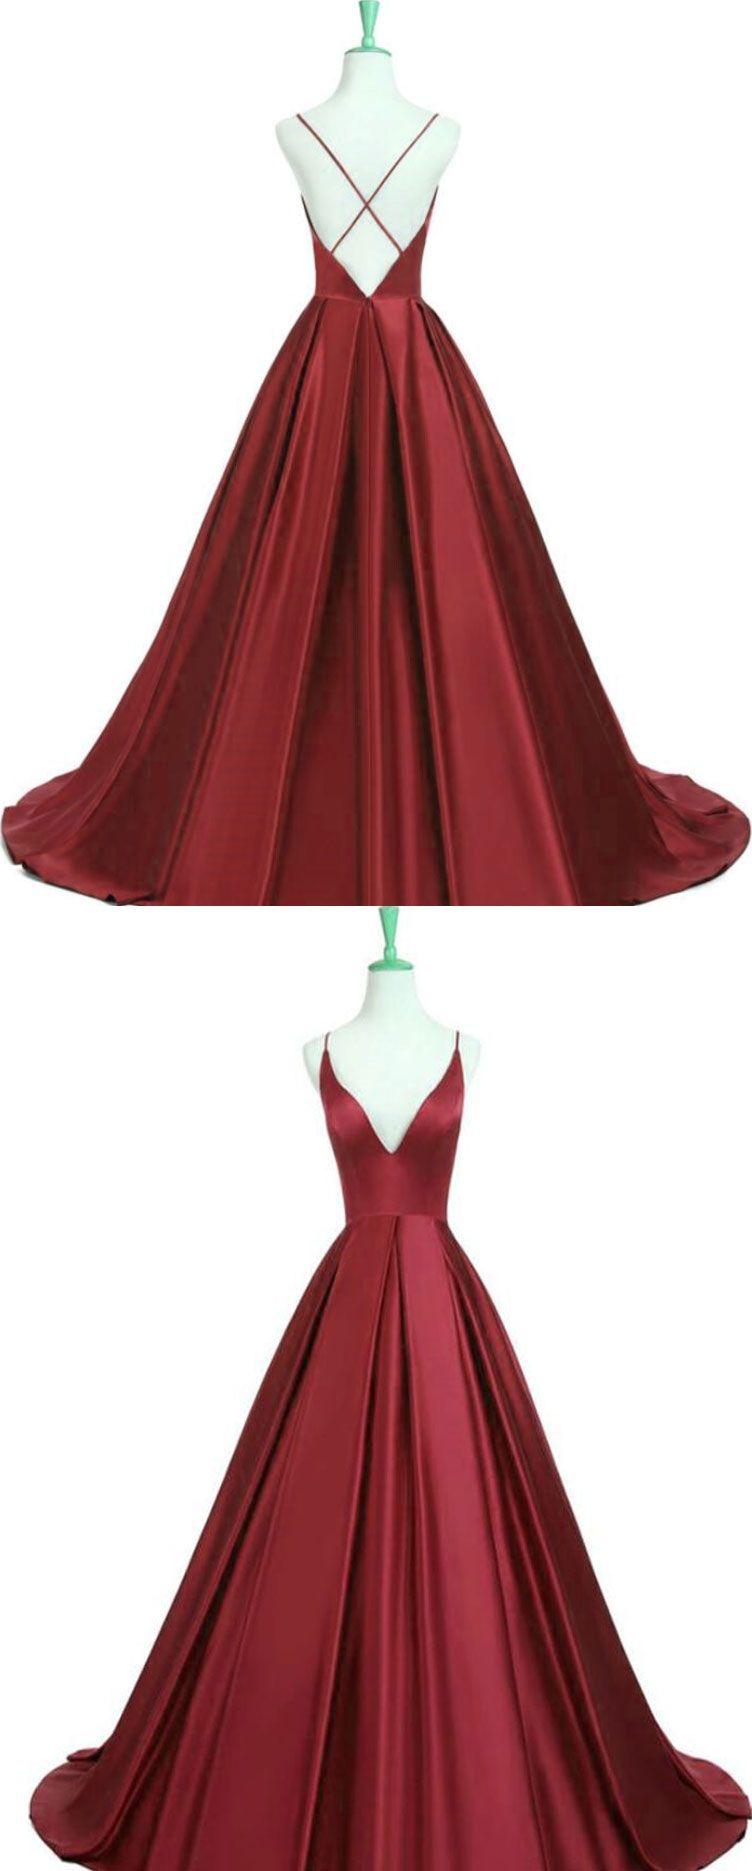 Criss cross prom dresses spaghetii straps prom dresses womenus